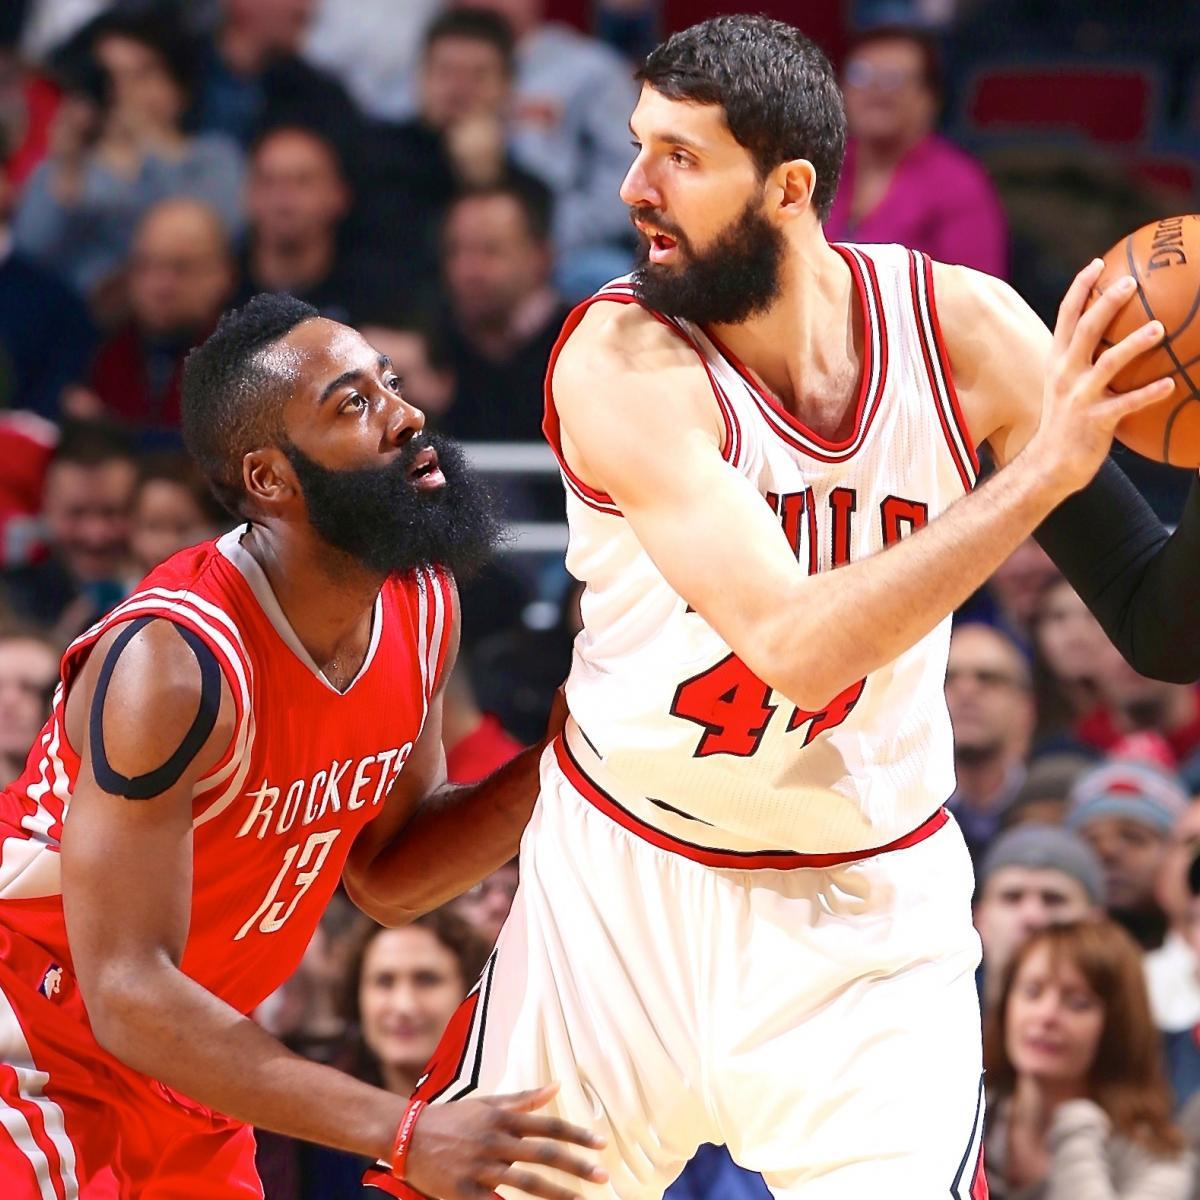 Houston Rockets Defensive Coach: Houston Rockets Vs. Chicago Bulls: Live Score, Highlights